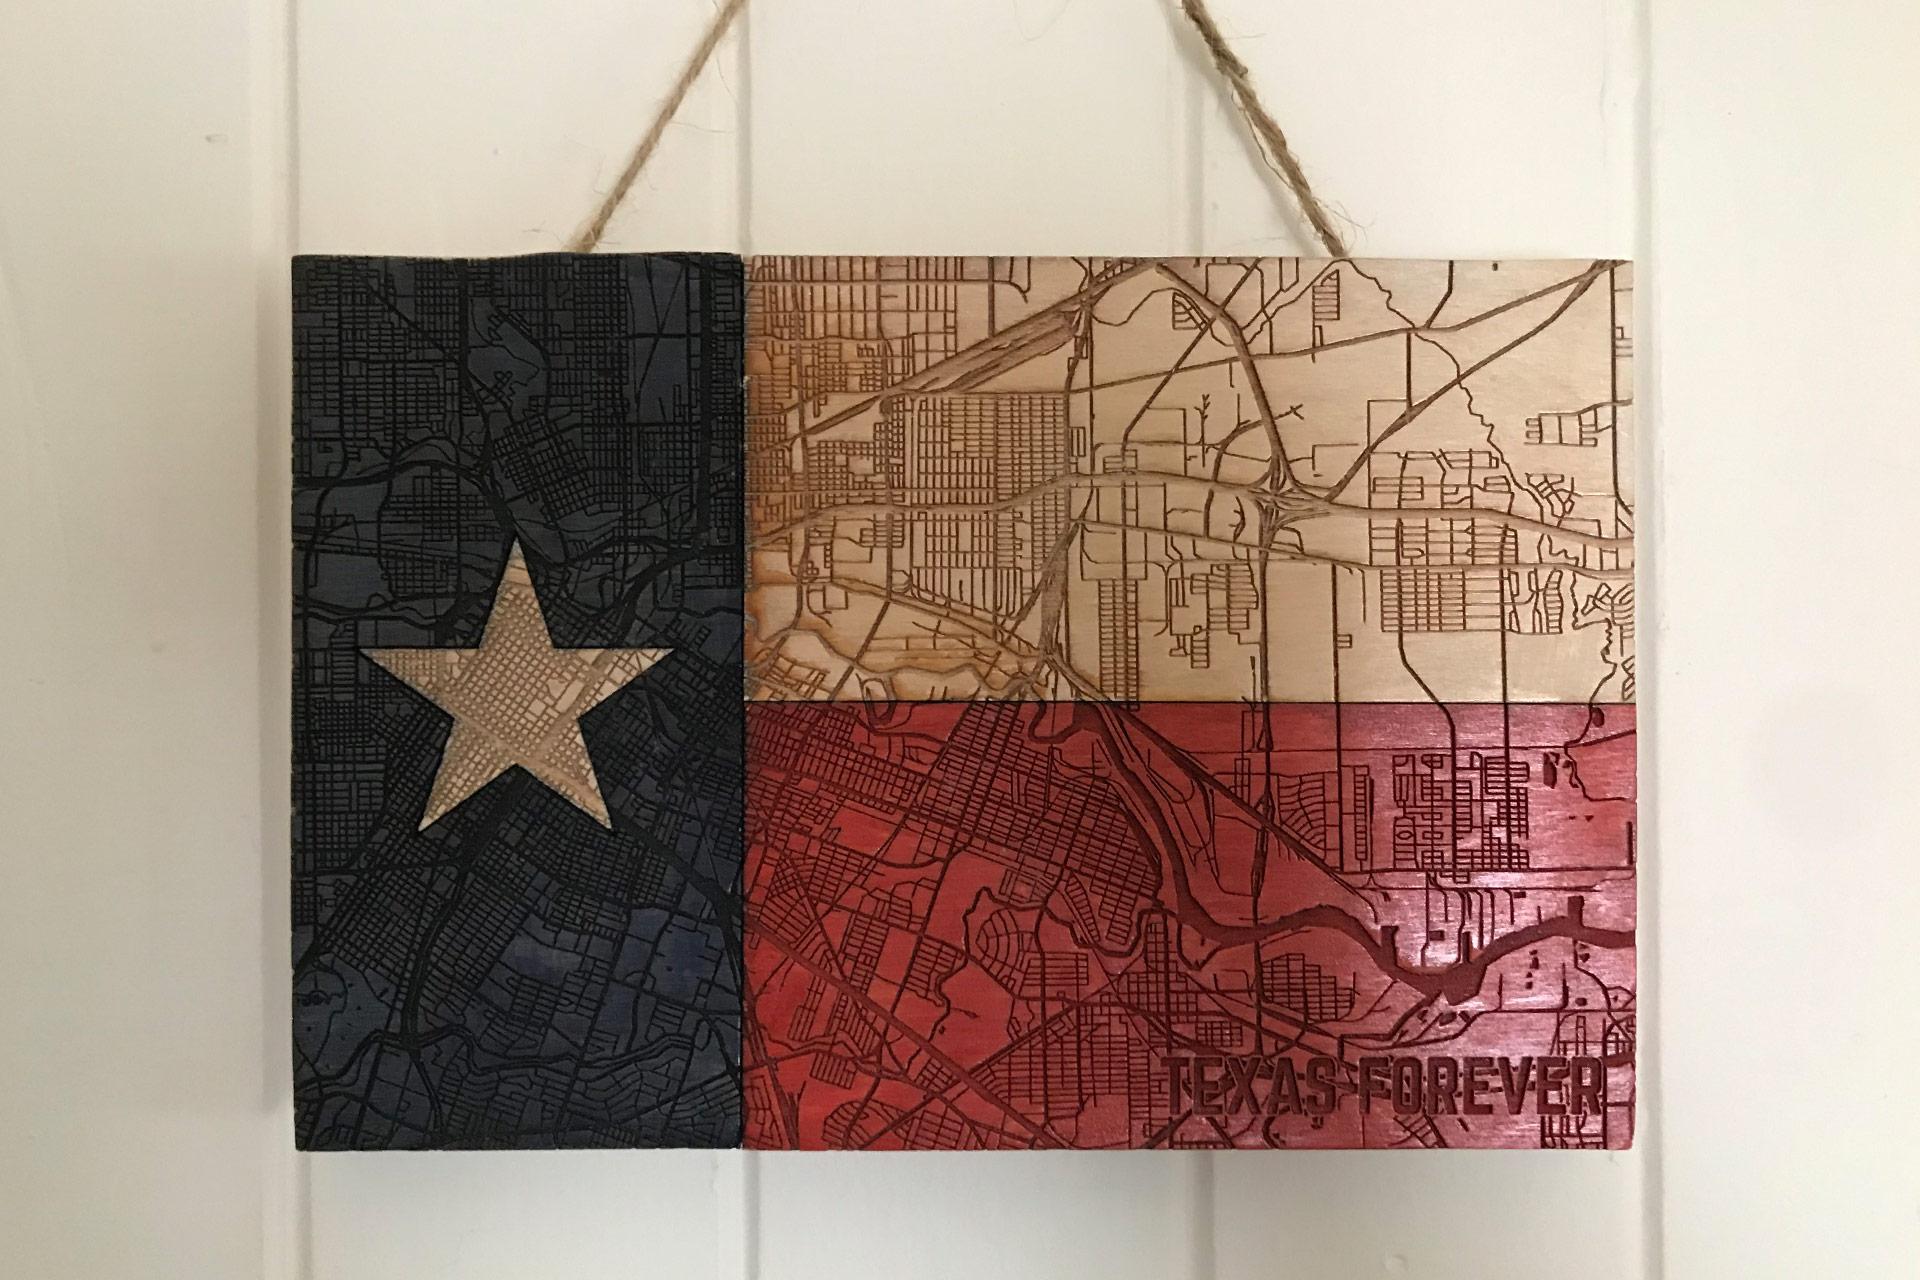 MikeSpencerDesign-Extras-TexasFlagDetail-1920×1280-1